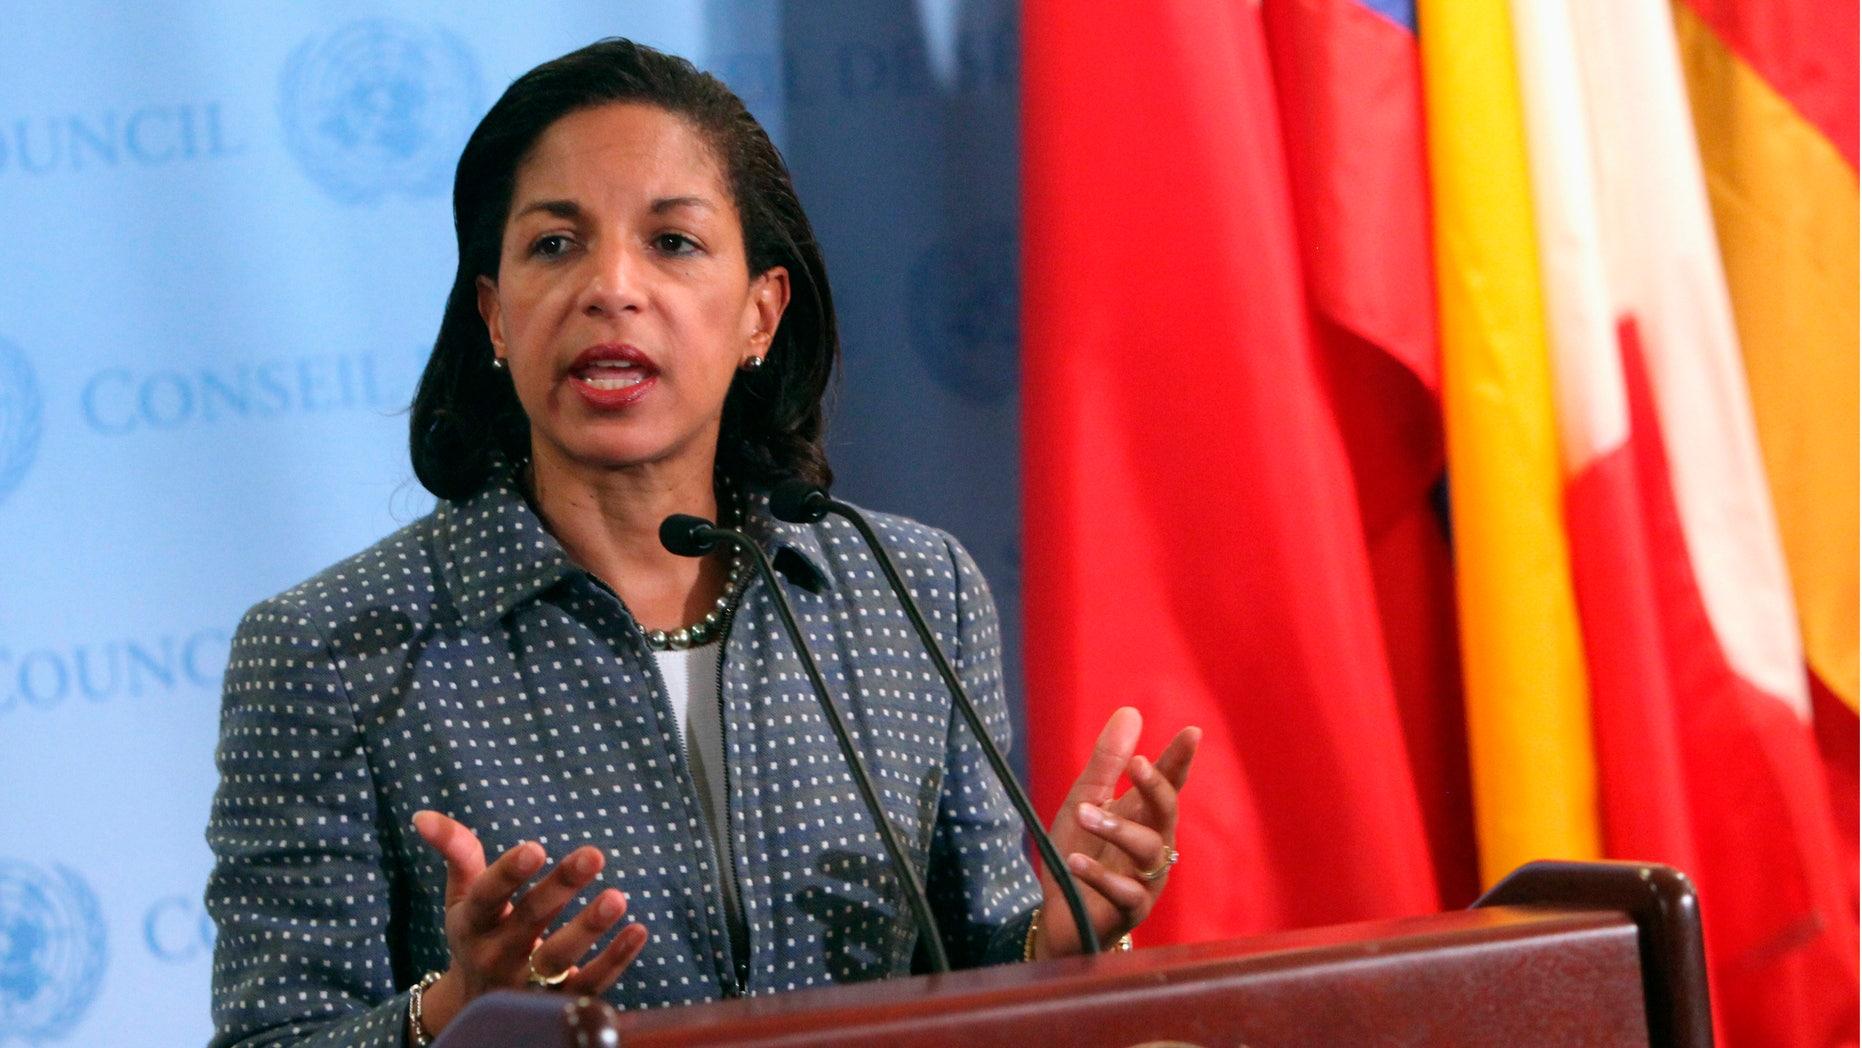 FILE: June 7, 2012: Susan Rice, U.S. ambassador to the United Nations, talks at U.N. headquarters in New York.